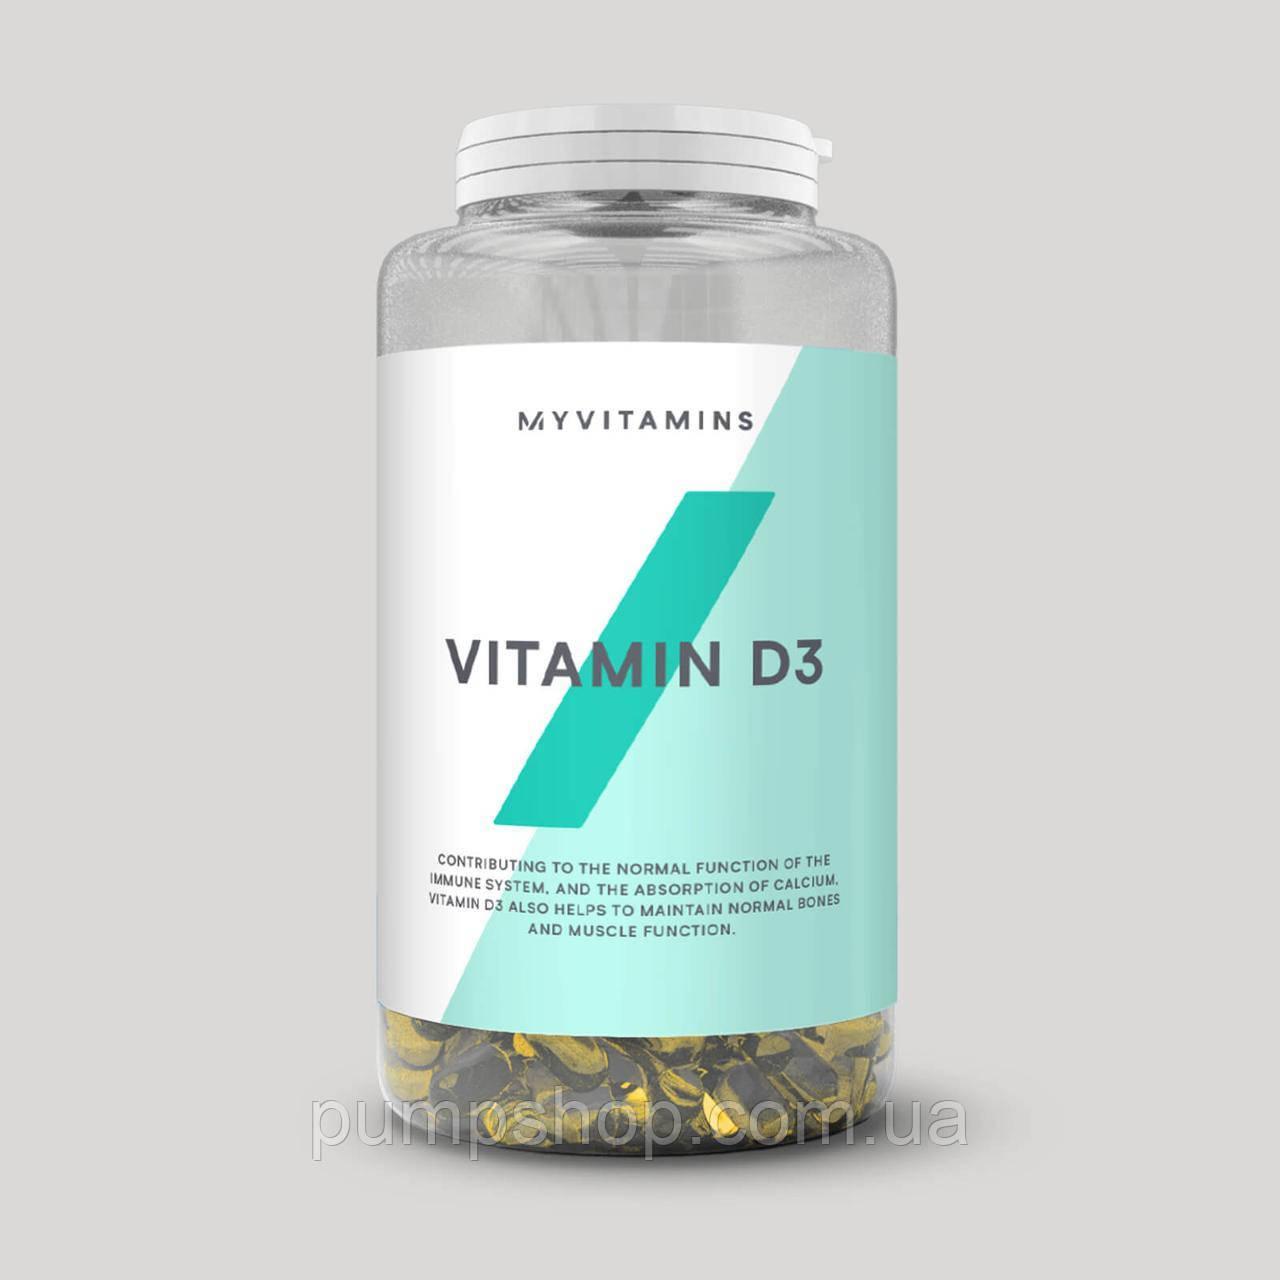 Витамин D3 Myprotein Vitamin D3 2500ME 360 капсул